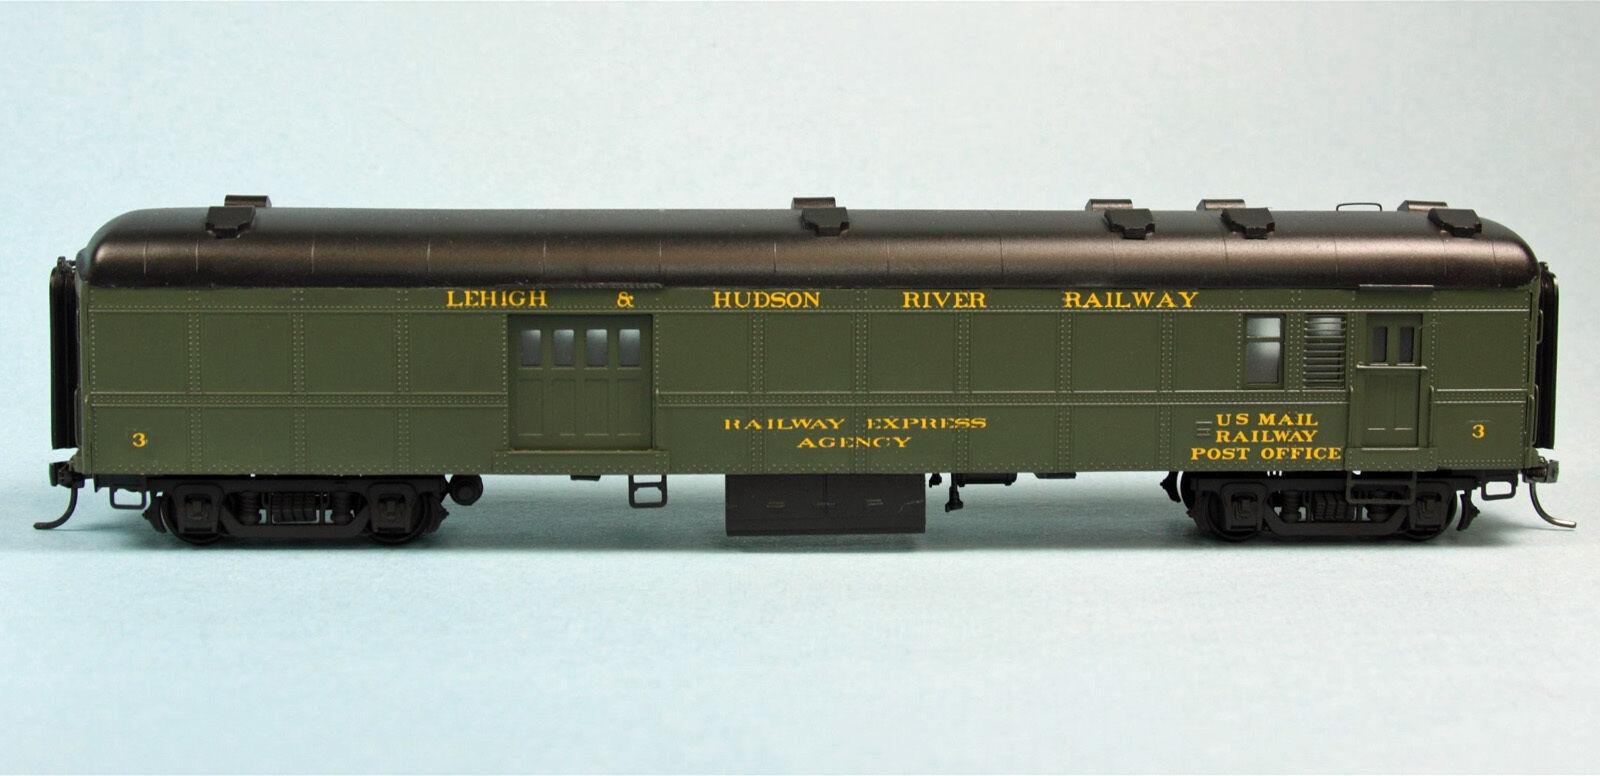 NORFOLK & WESTERN MS3 MAIL STORAGE CAR HO Model Railroad Unpainted Kit BC1432